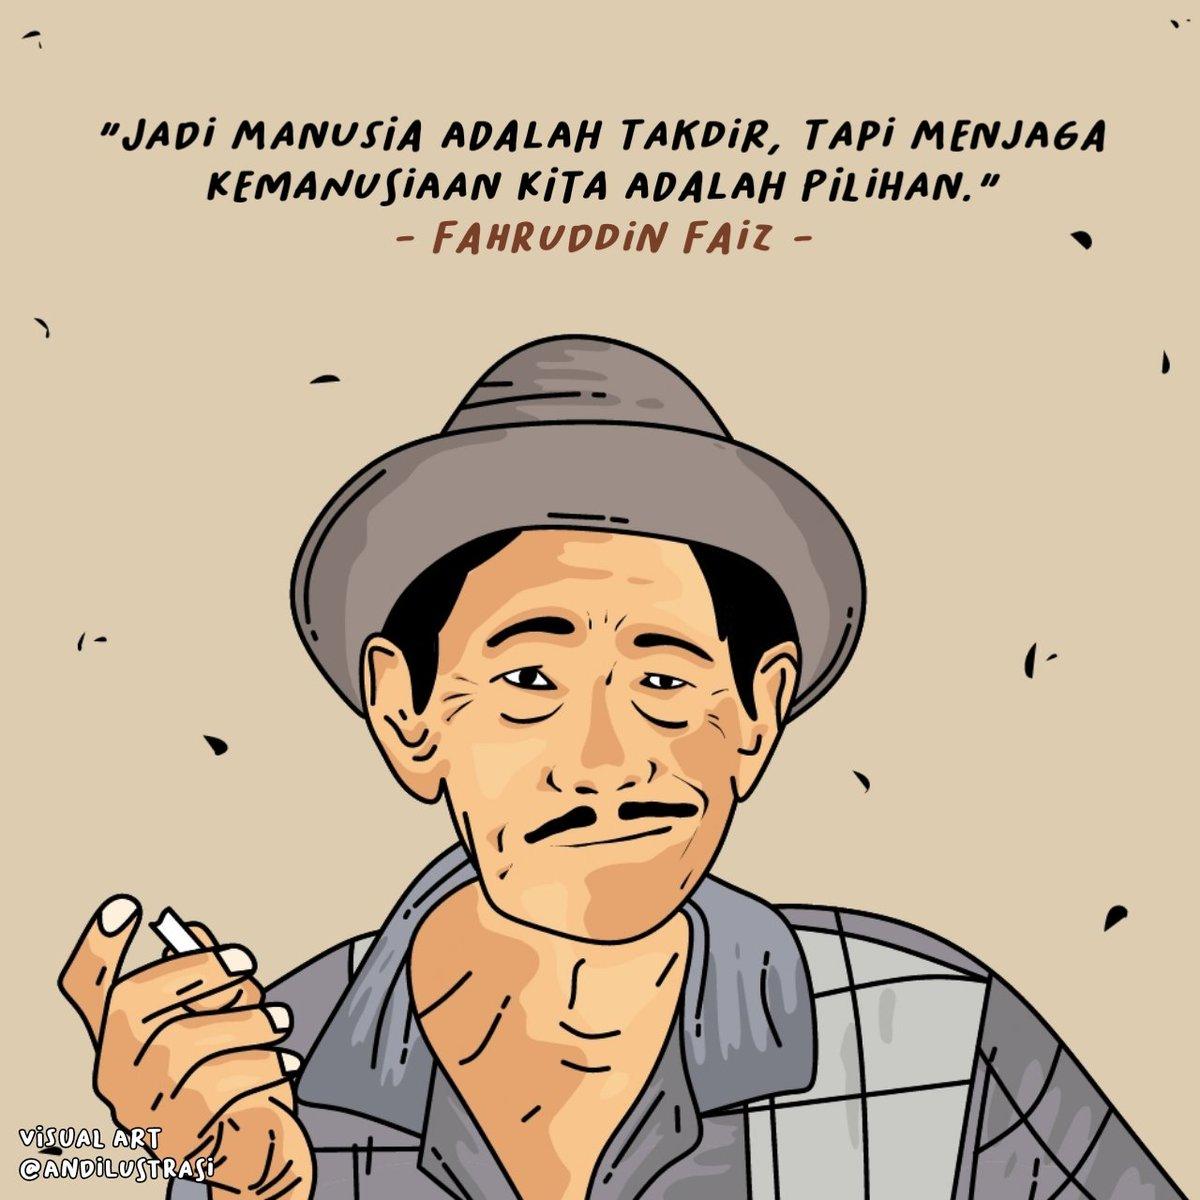 Manusia . . . #andilustrasi #illustration #seniman #art #masakecil #generasi90an #gambarkartun #karyavisual #kartunmuslimah #masakecilbahagia #selalubersyukur #vectorart #ilustrasikartun #ilustrasi #kartundakwah #quoteindonesia #quoteindo #senimankata #senimanindonesia